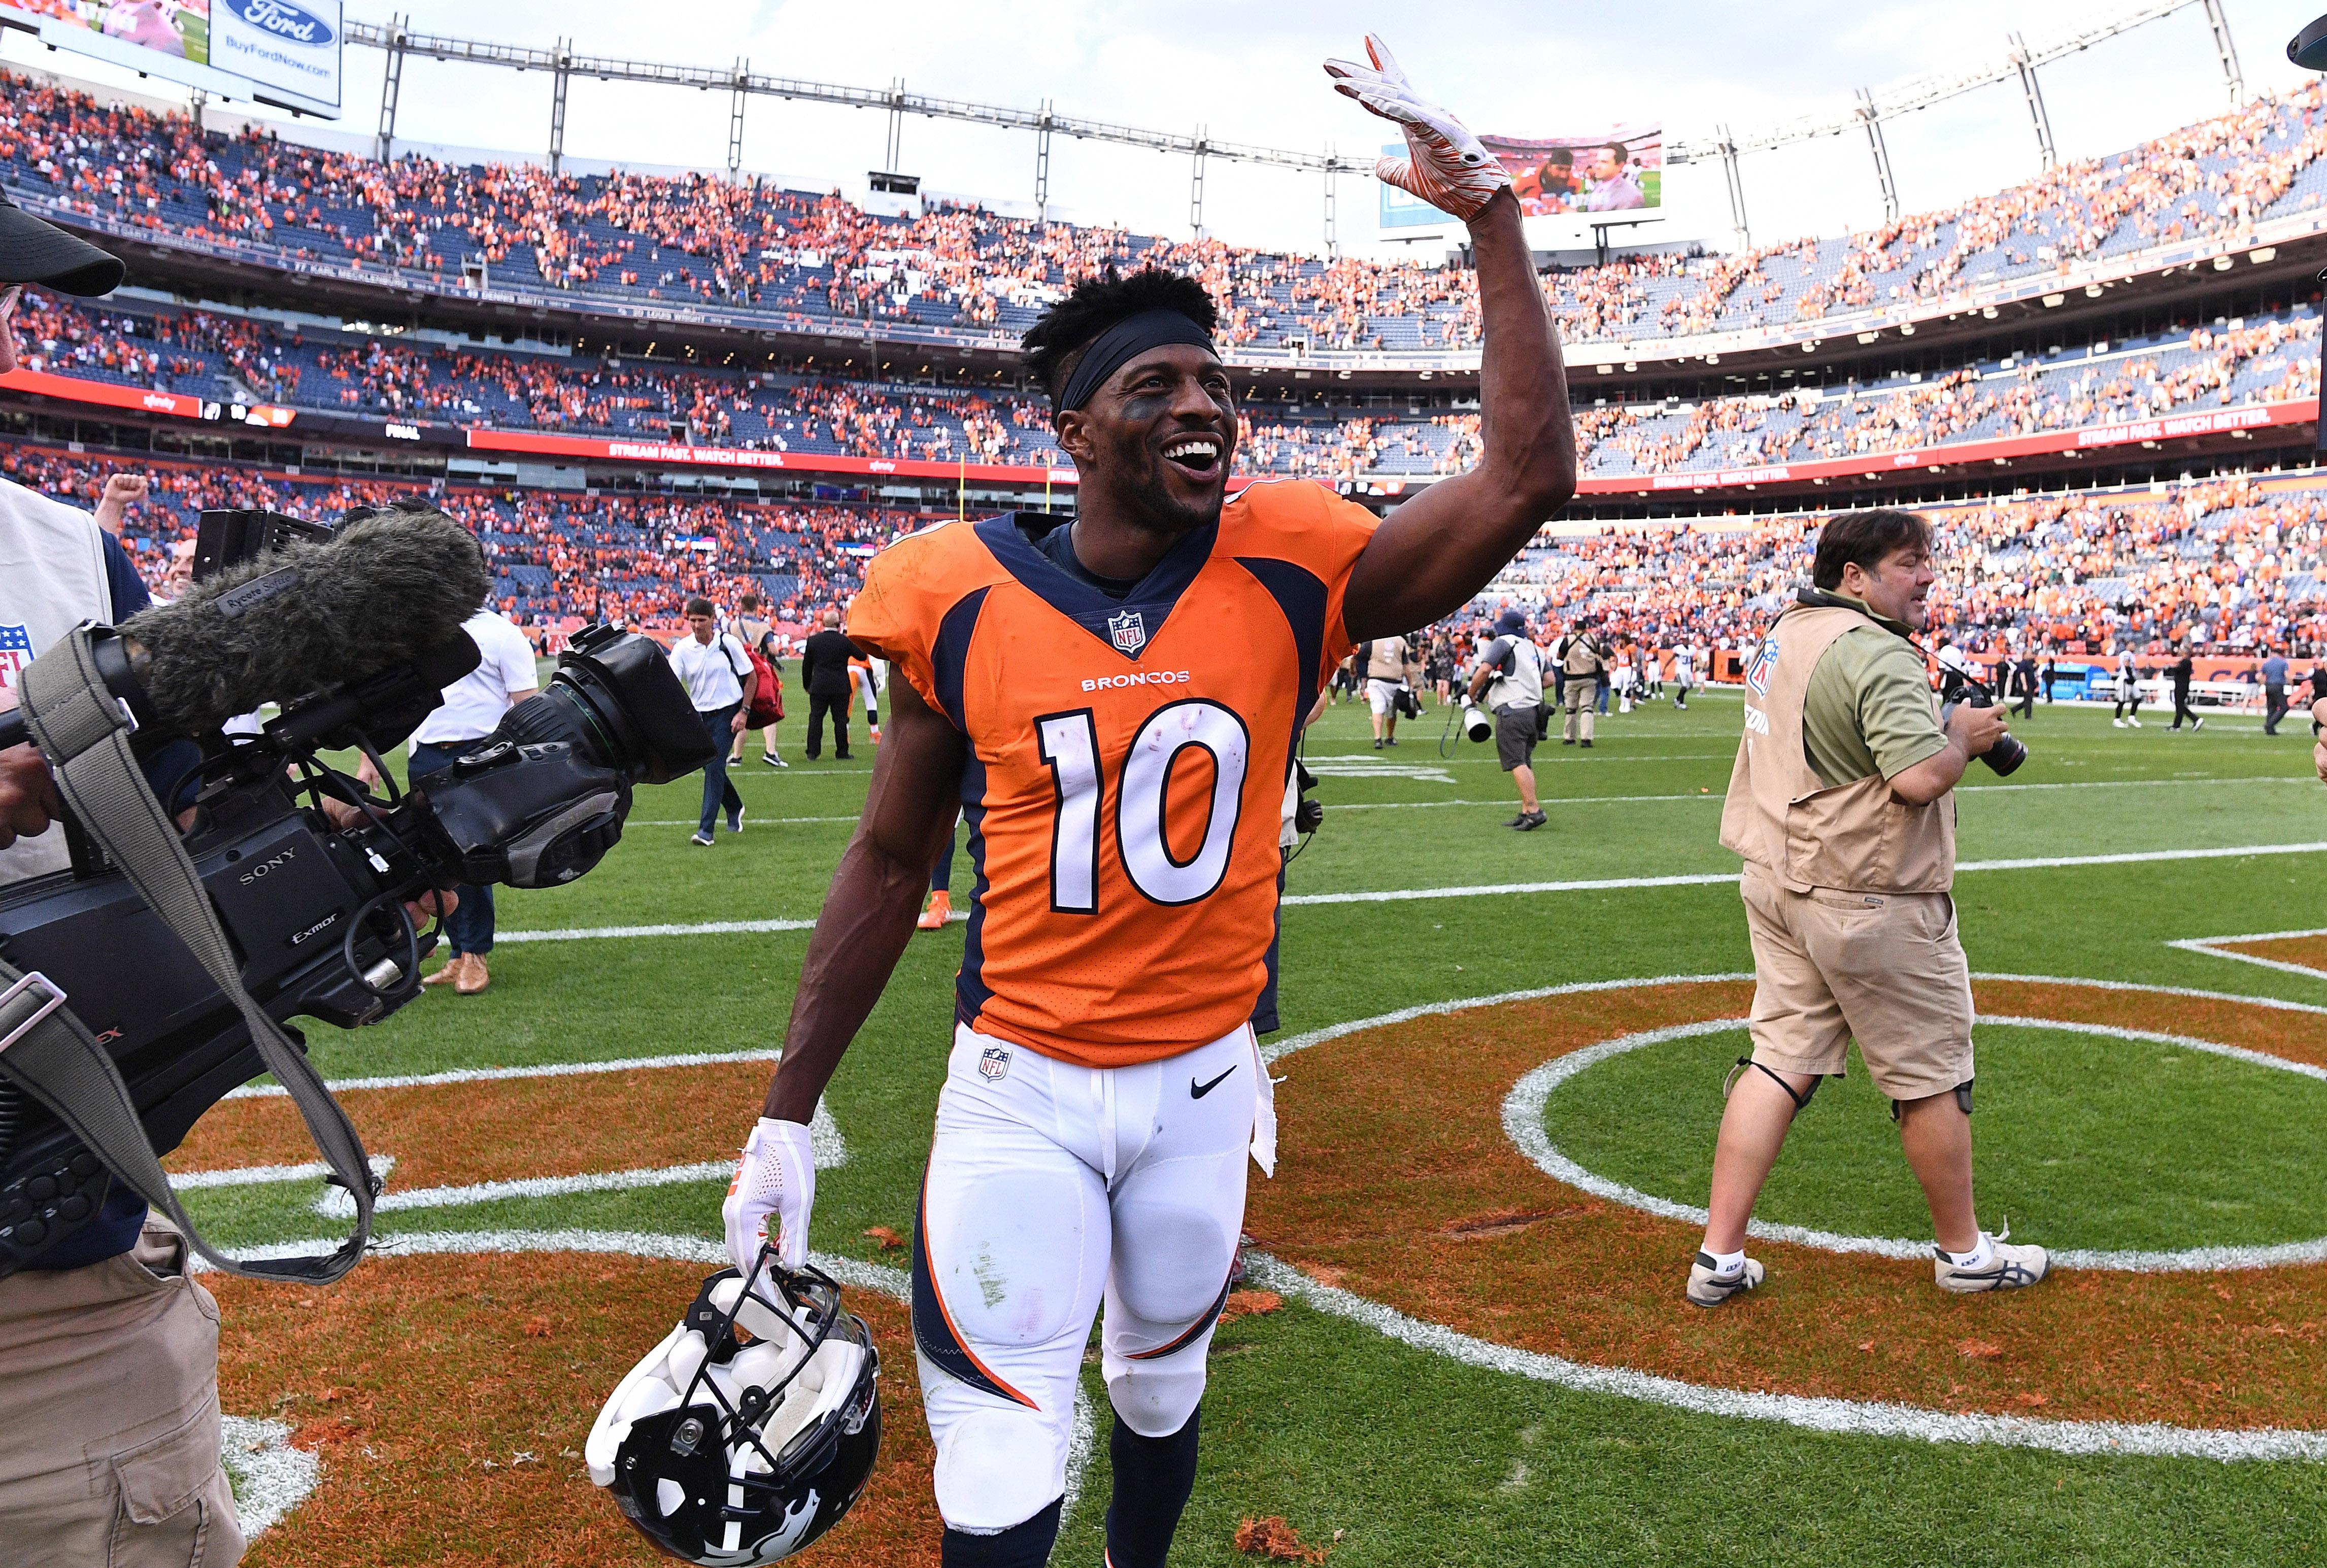 Denver Broncos wide receiver Emmanuel Sanders (10) celebrates the win over the Oakland Raiders at Broncos Stadium at Mile High.